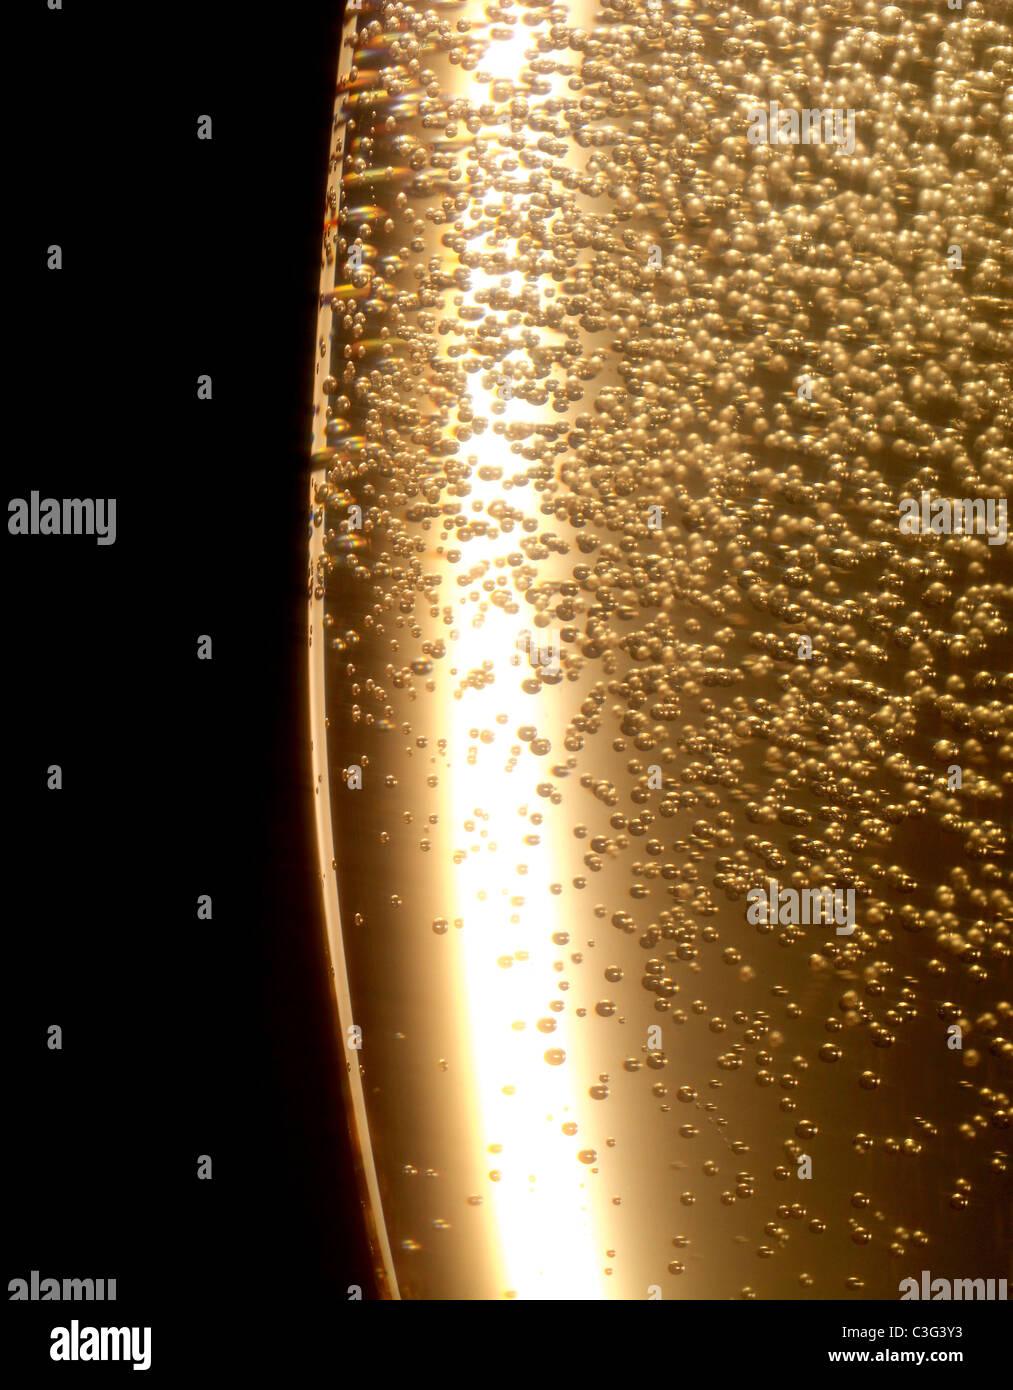 Champagne Imagen De Stock